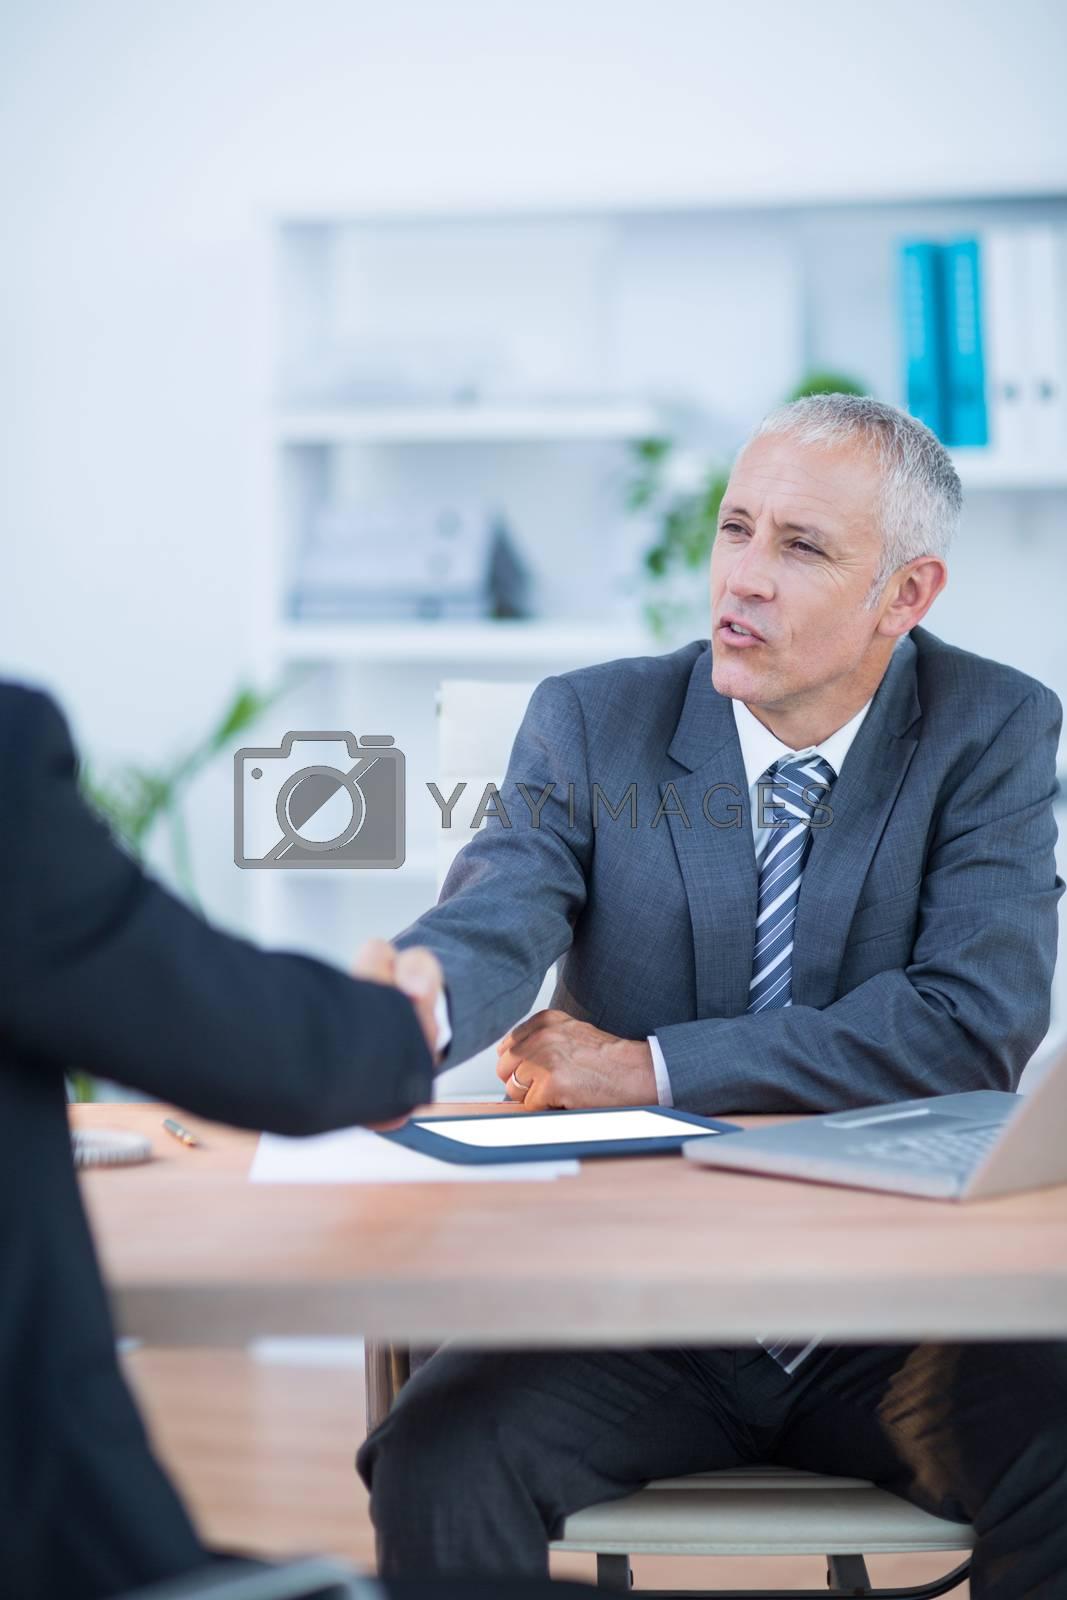 Royalty free image of Happy businessmen shaking hands by Wavebreakmedia